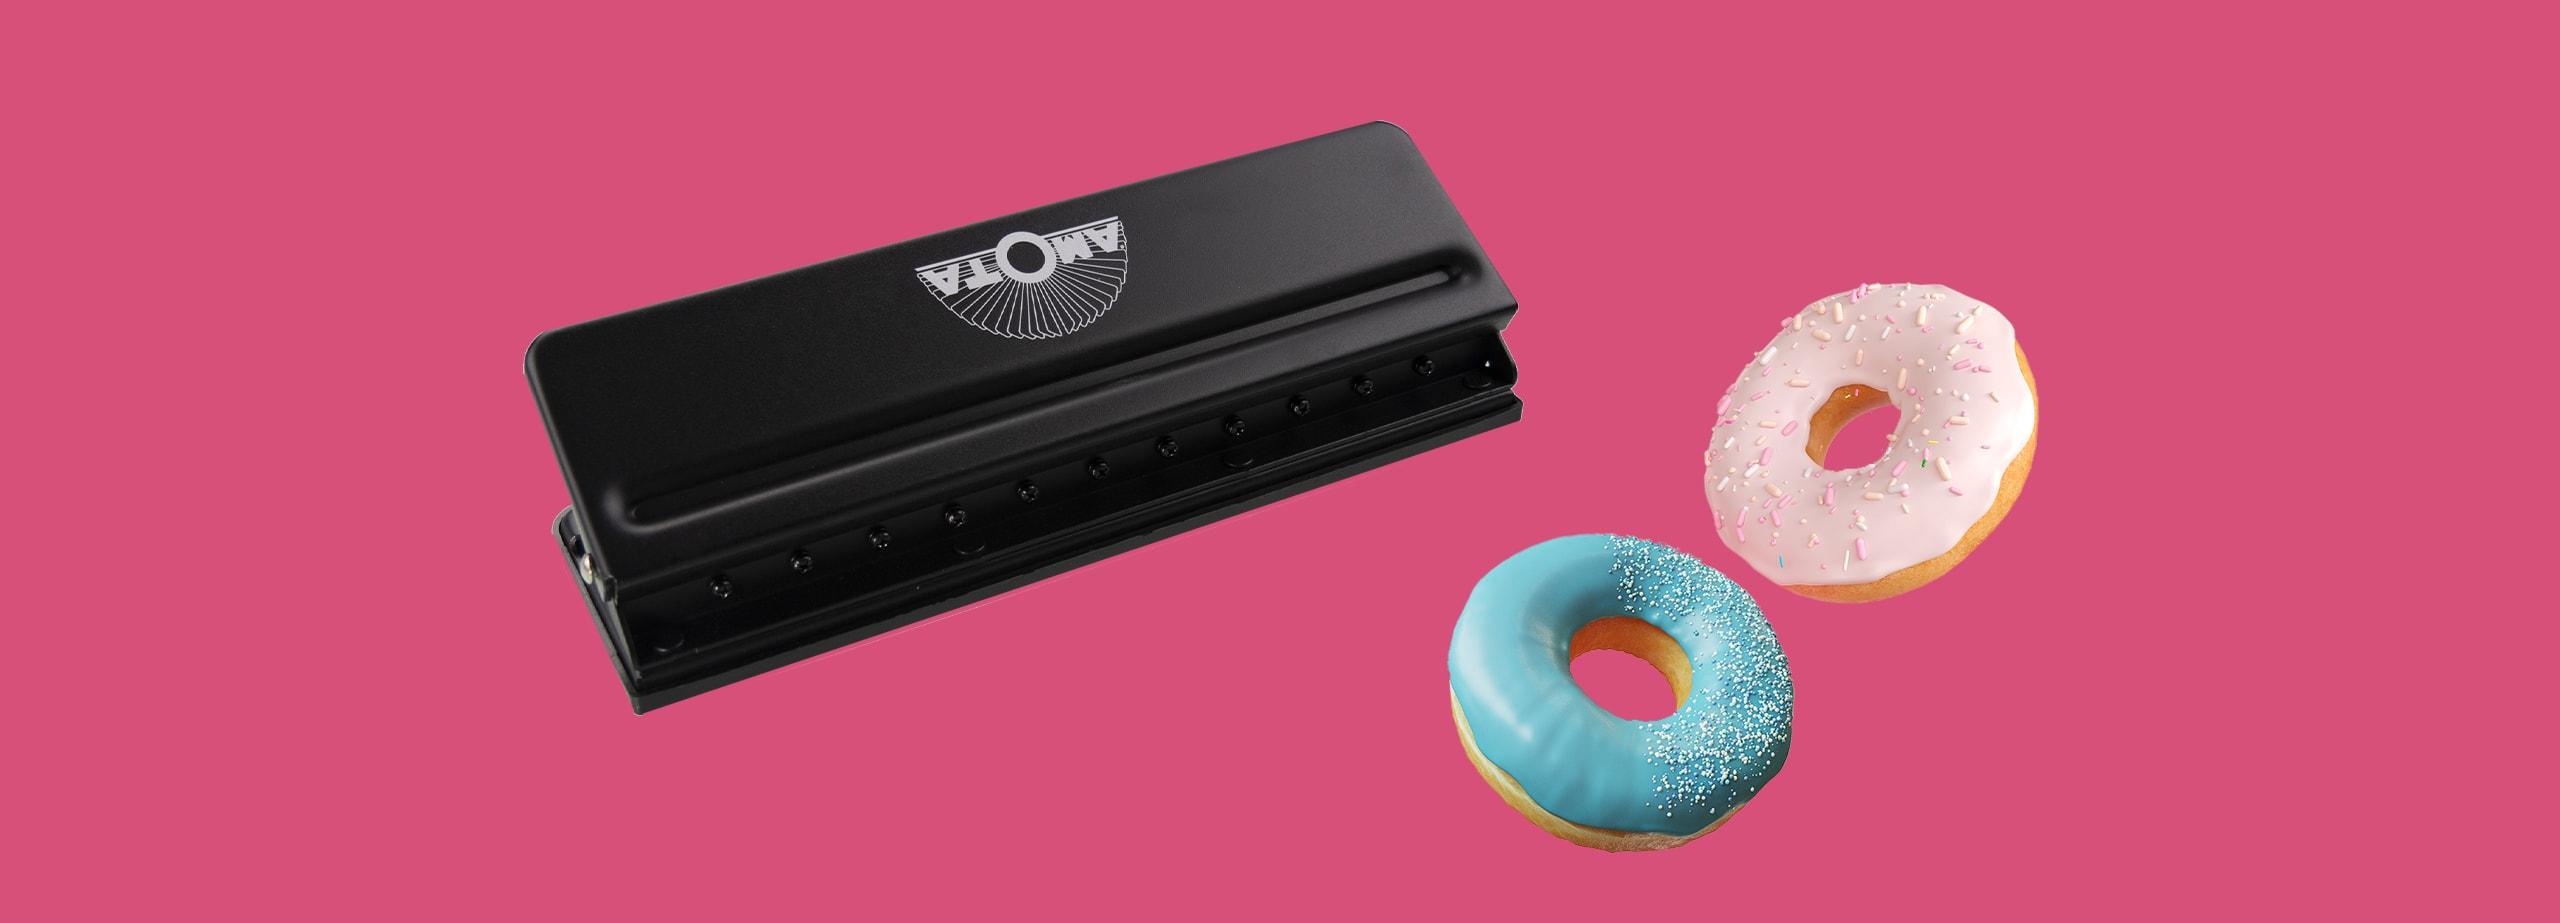 Atoma - Perforateur Atoma